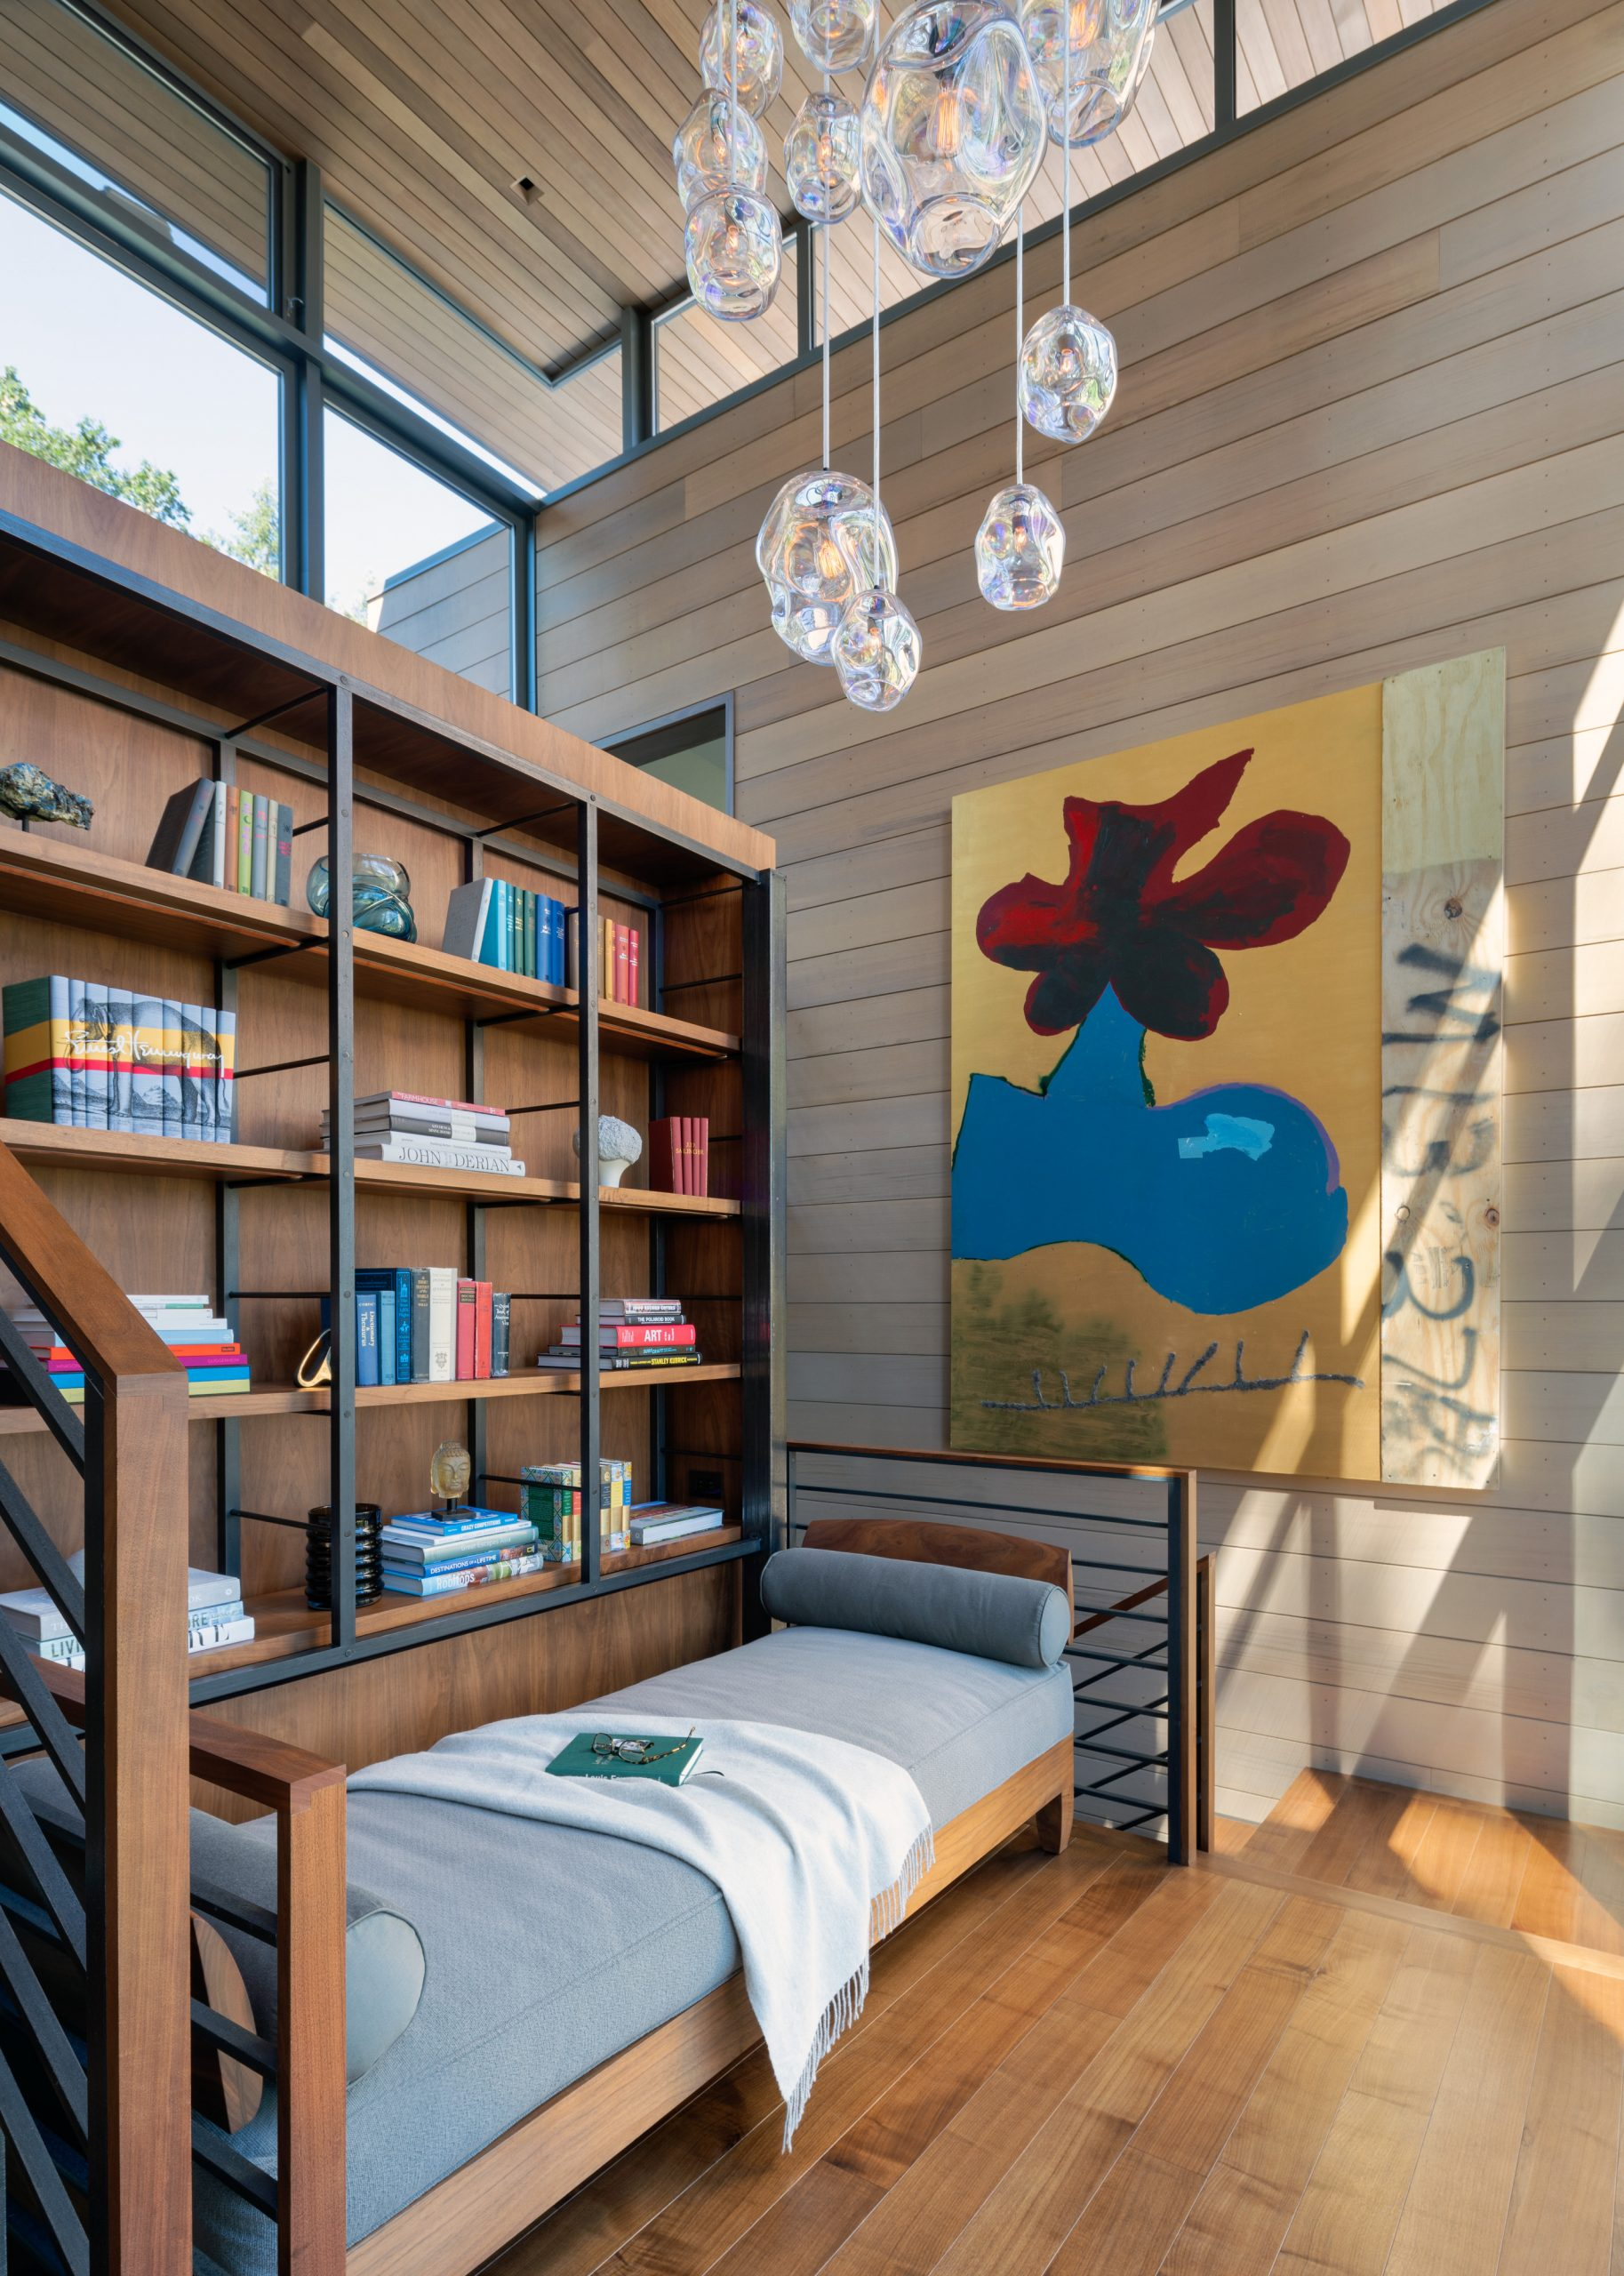 mw design workshop custom bookshelf cabinetry